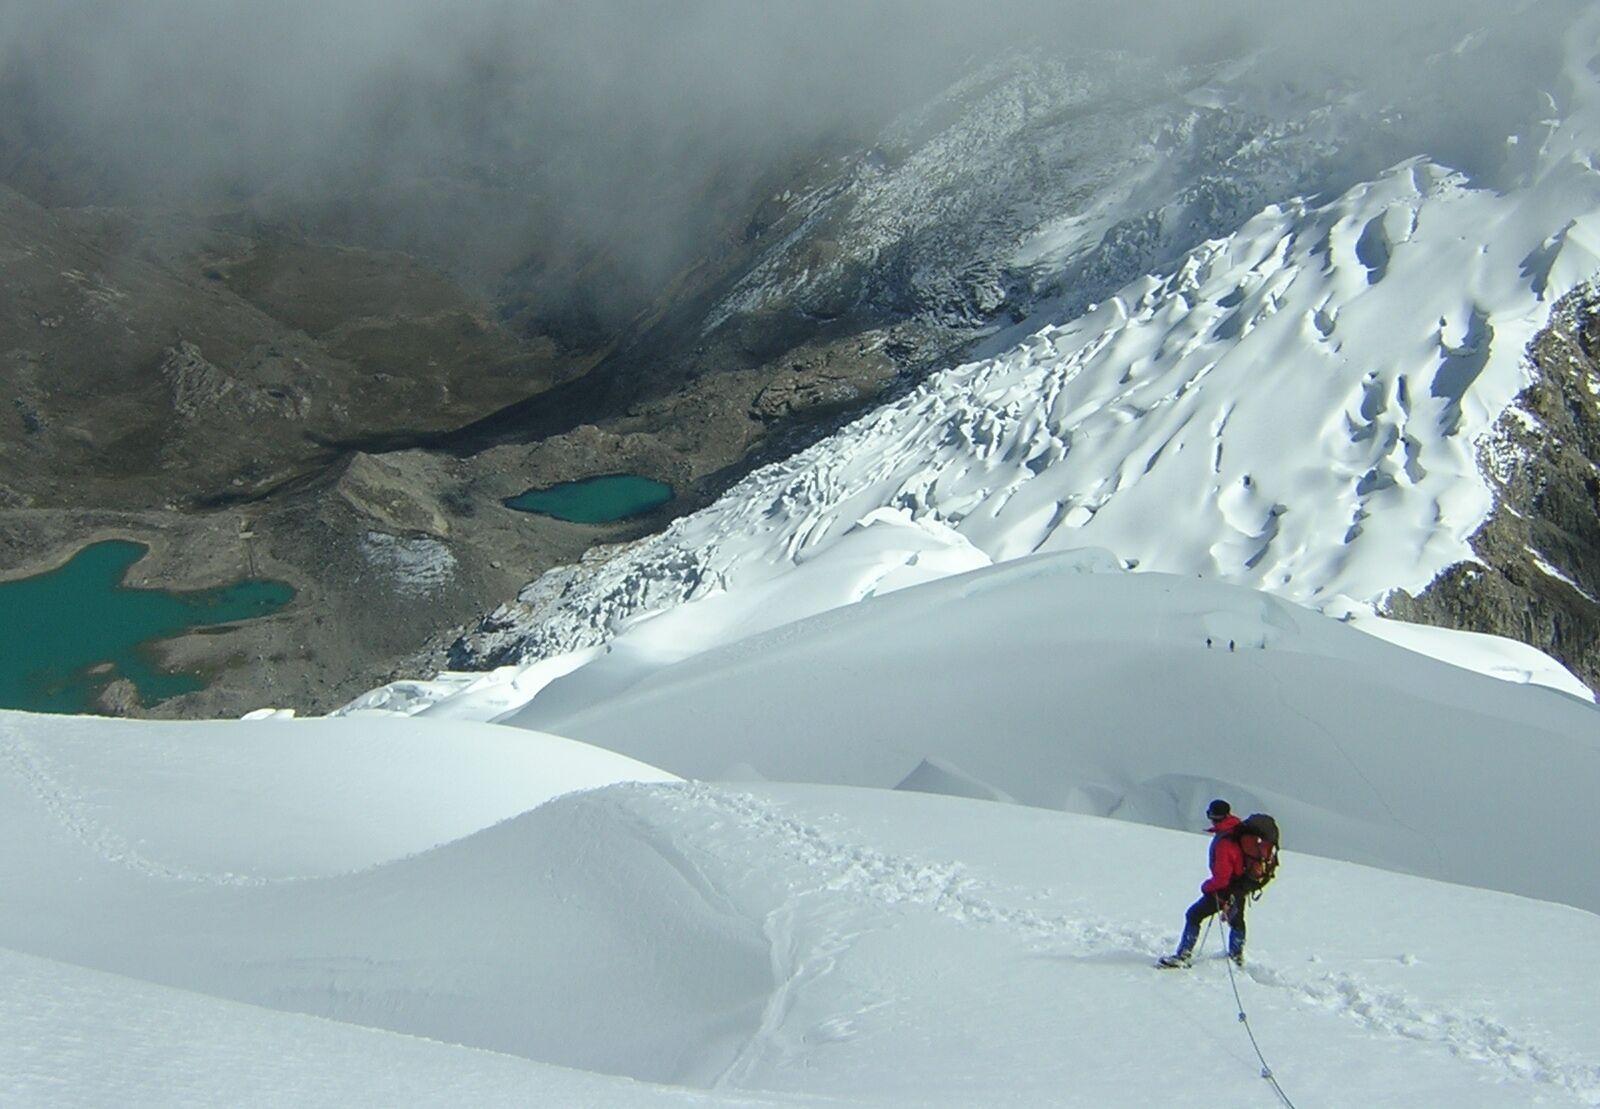 Peruvian Andes, Cordillera Blanca climbing, trekking Peru